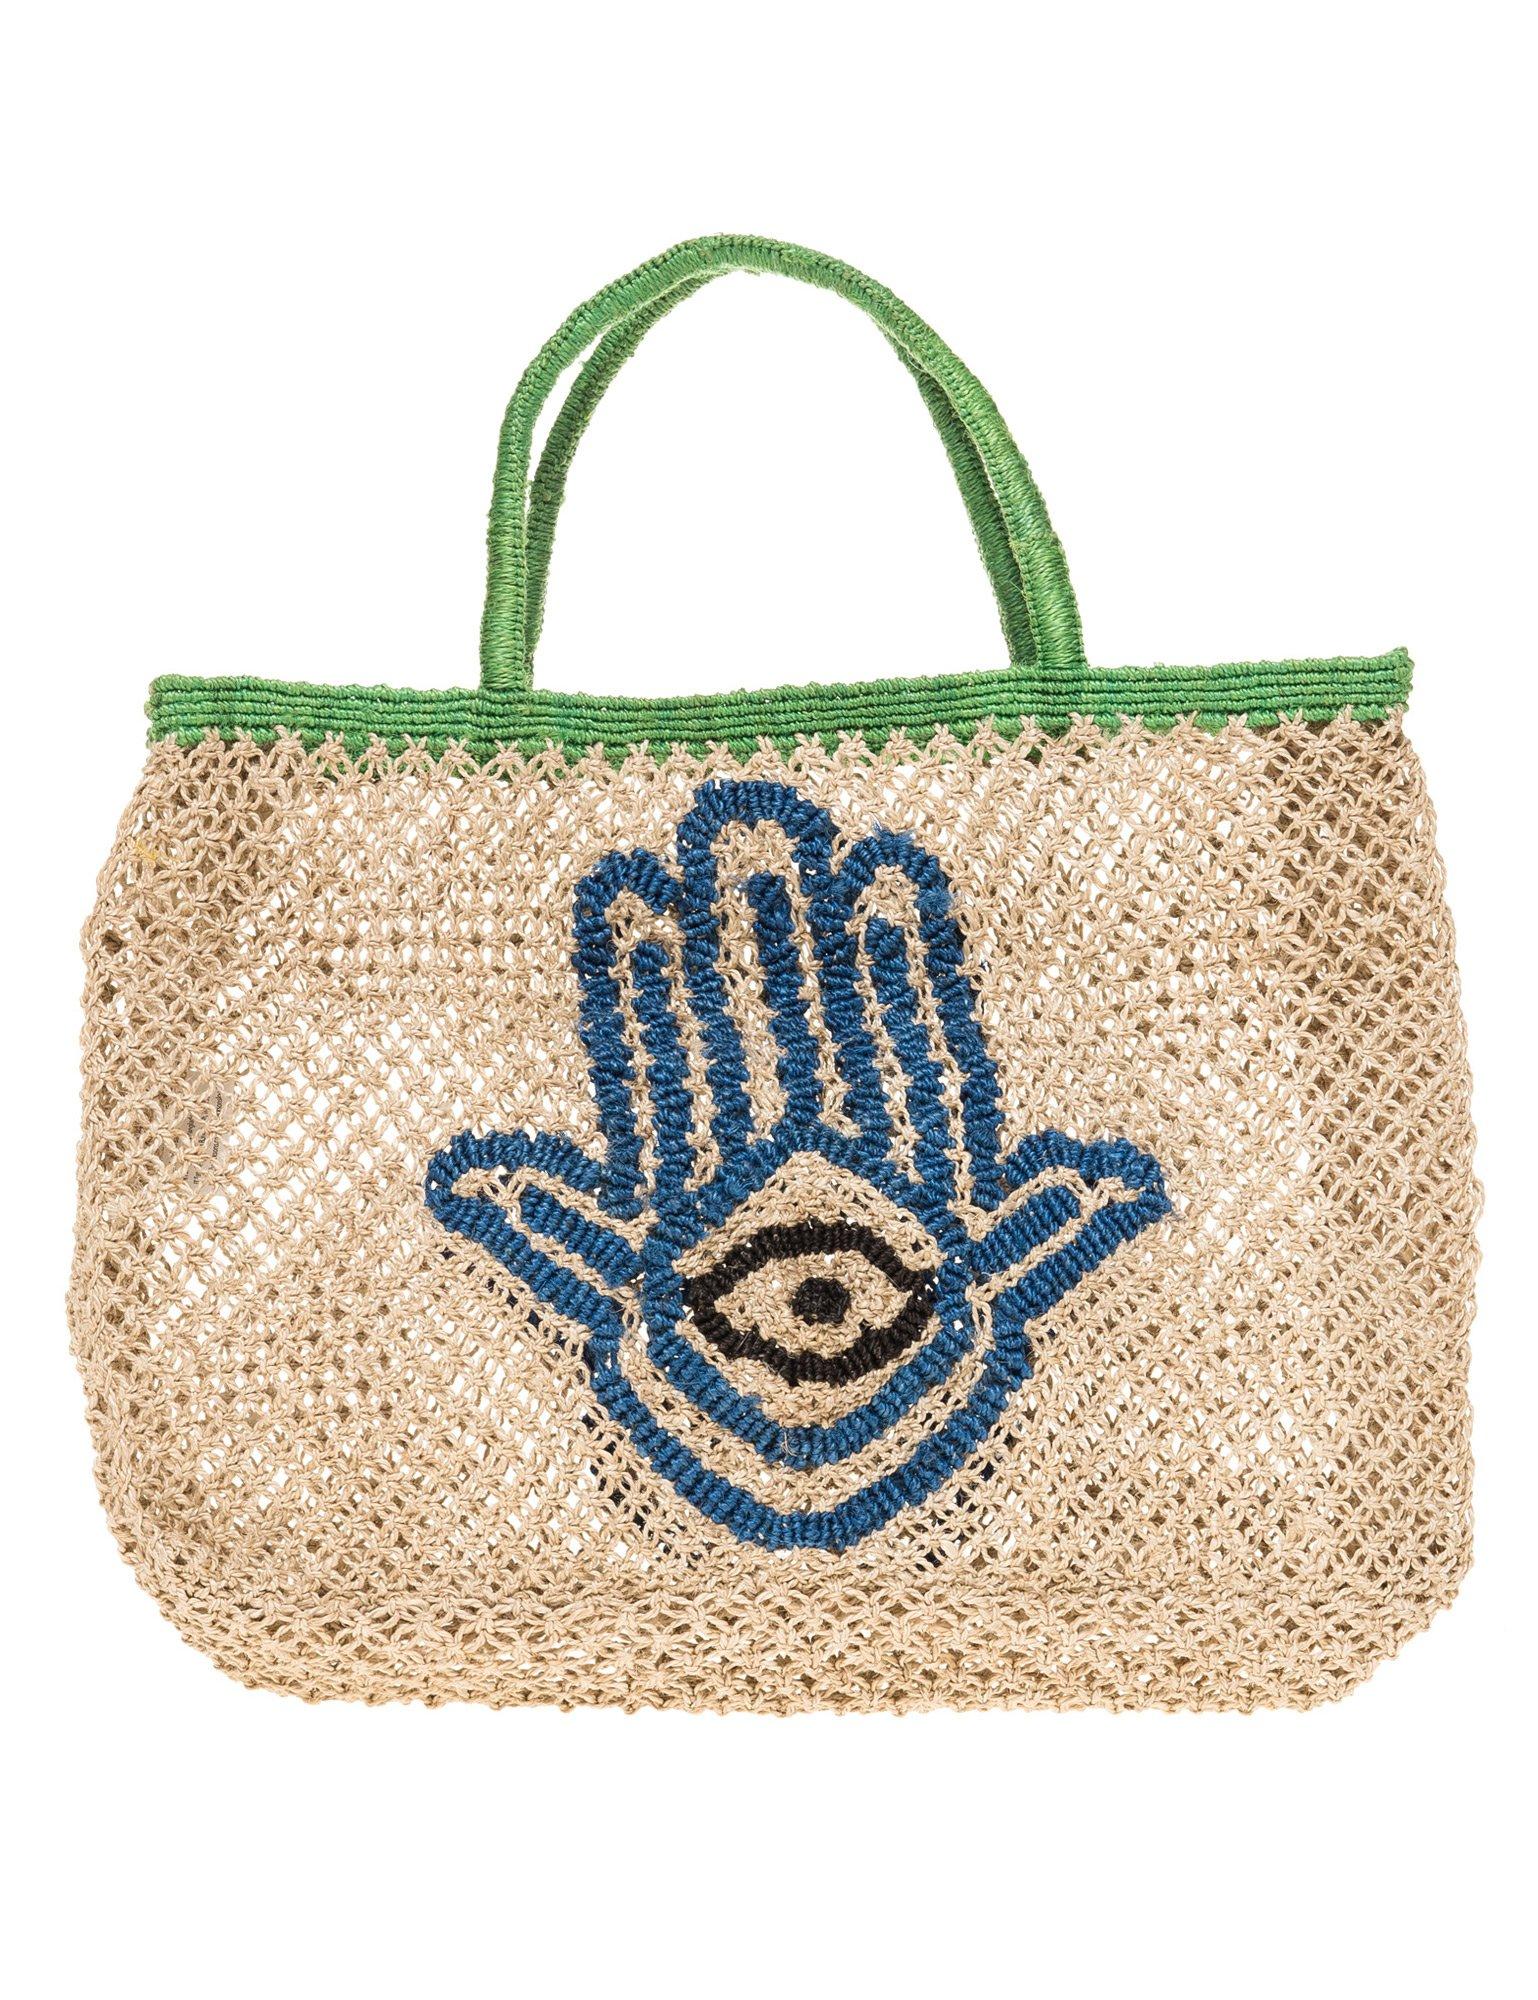 The Jacksons Women's Hand Of Fatima Small Women's Beige Jute Bag Beige